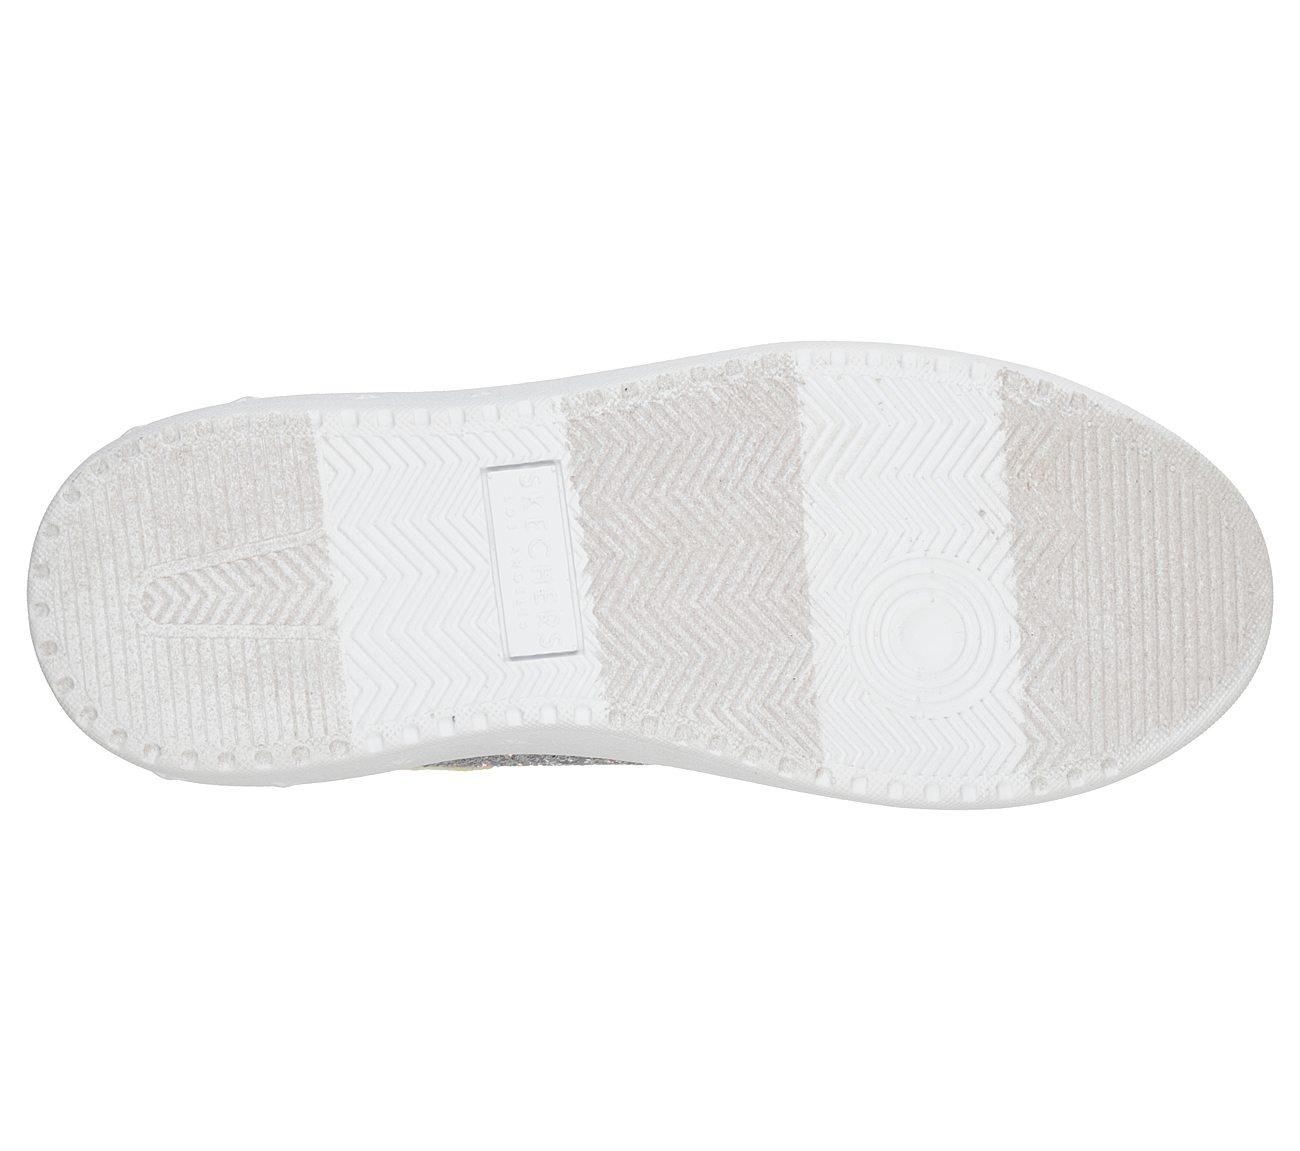 b594a7f88ce4 Buy SKECHERS High Street - Glitter Rockers Lace-Up Sneakers Shoes ...